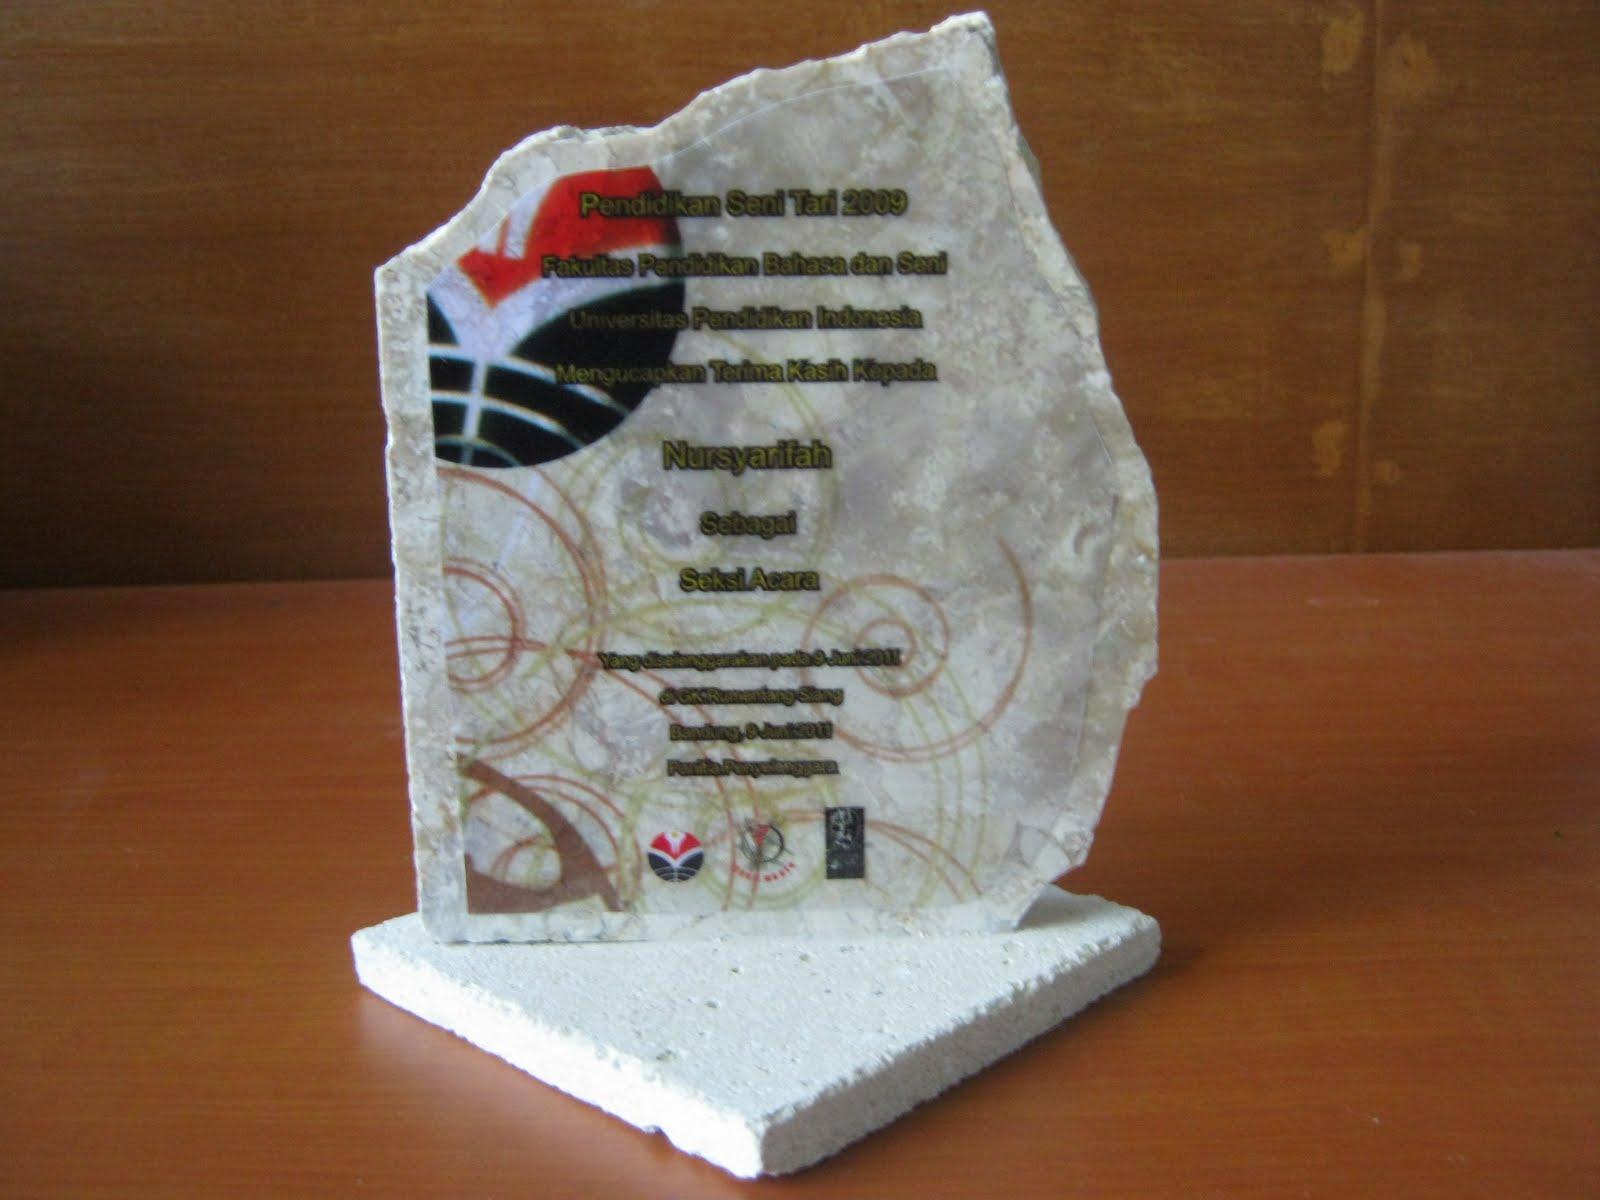 INSAN GROUP 1410: Desain plakat dari bahan batu marmer